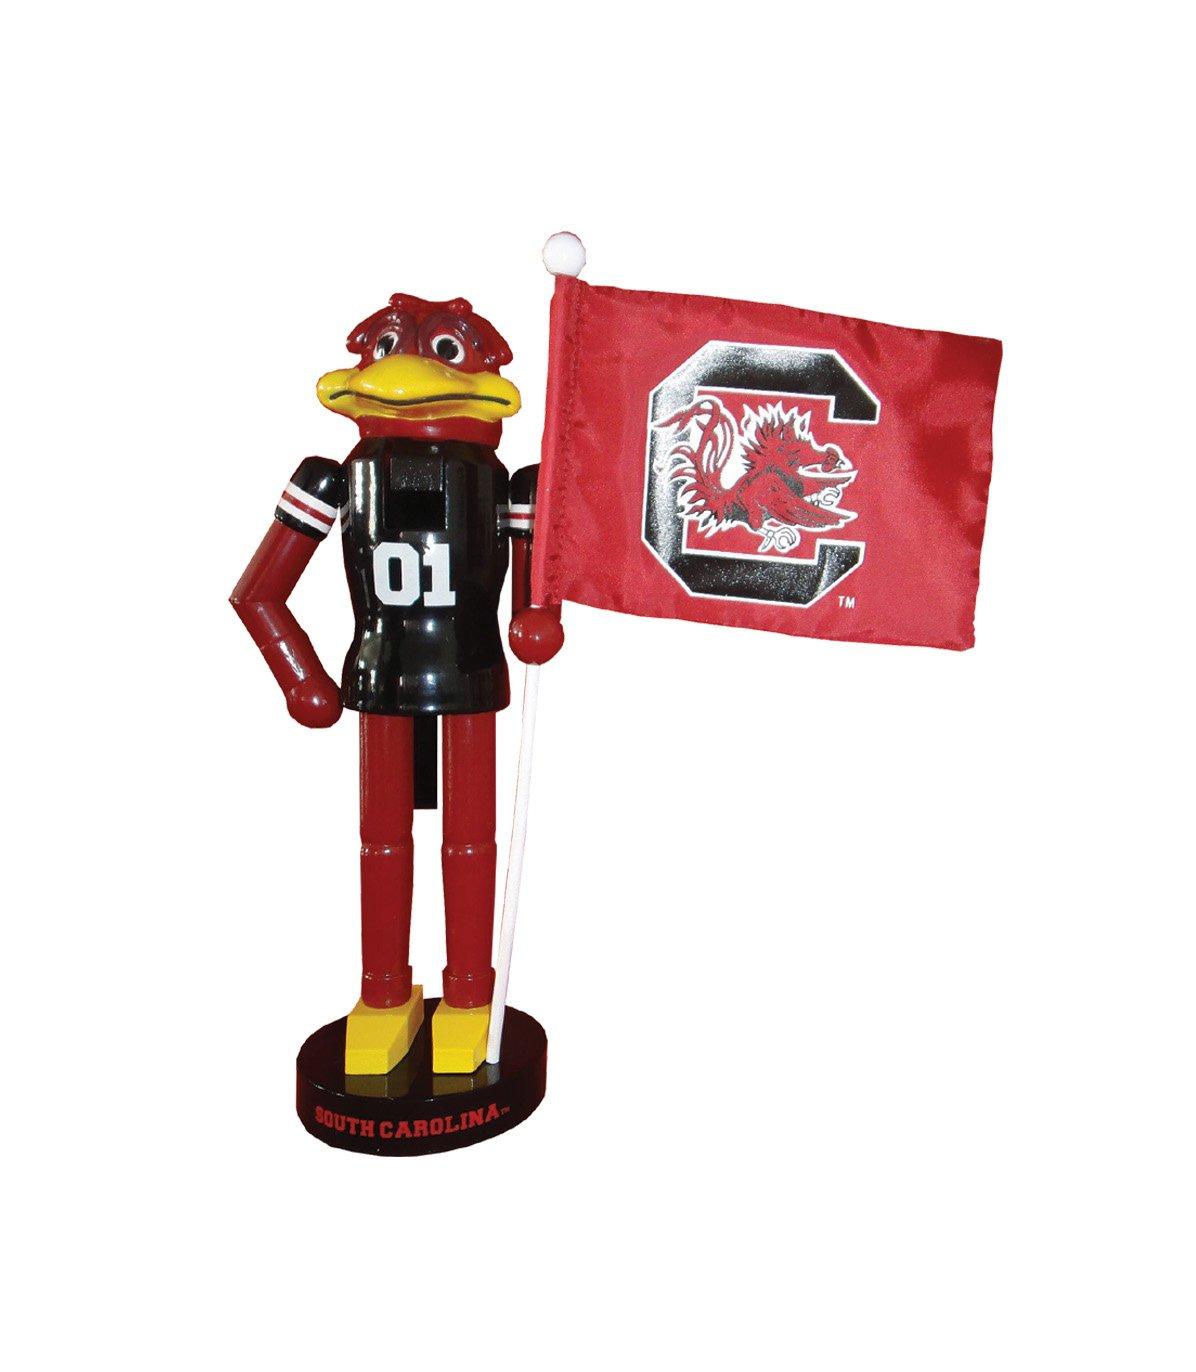 Festive College Football 12'' South Carolina Mascot & Flag Nutcracker by naturally home (Image #1)